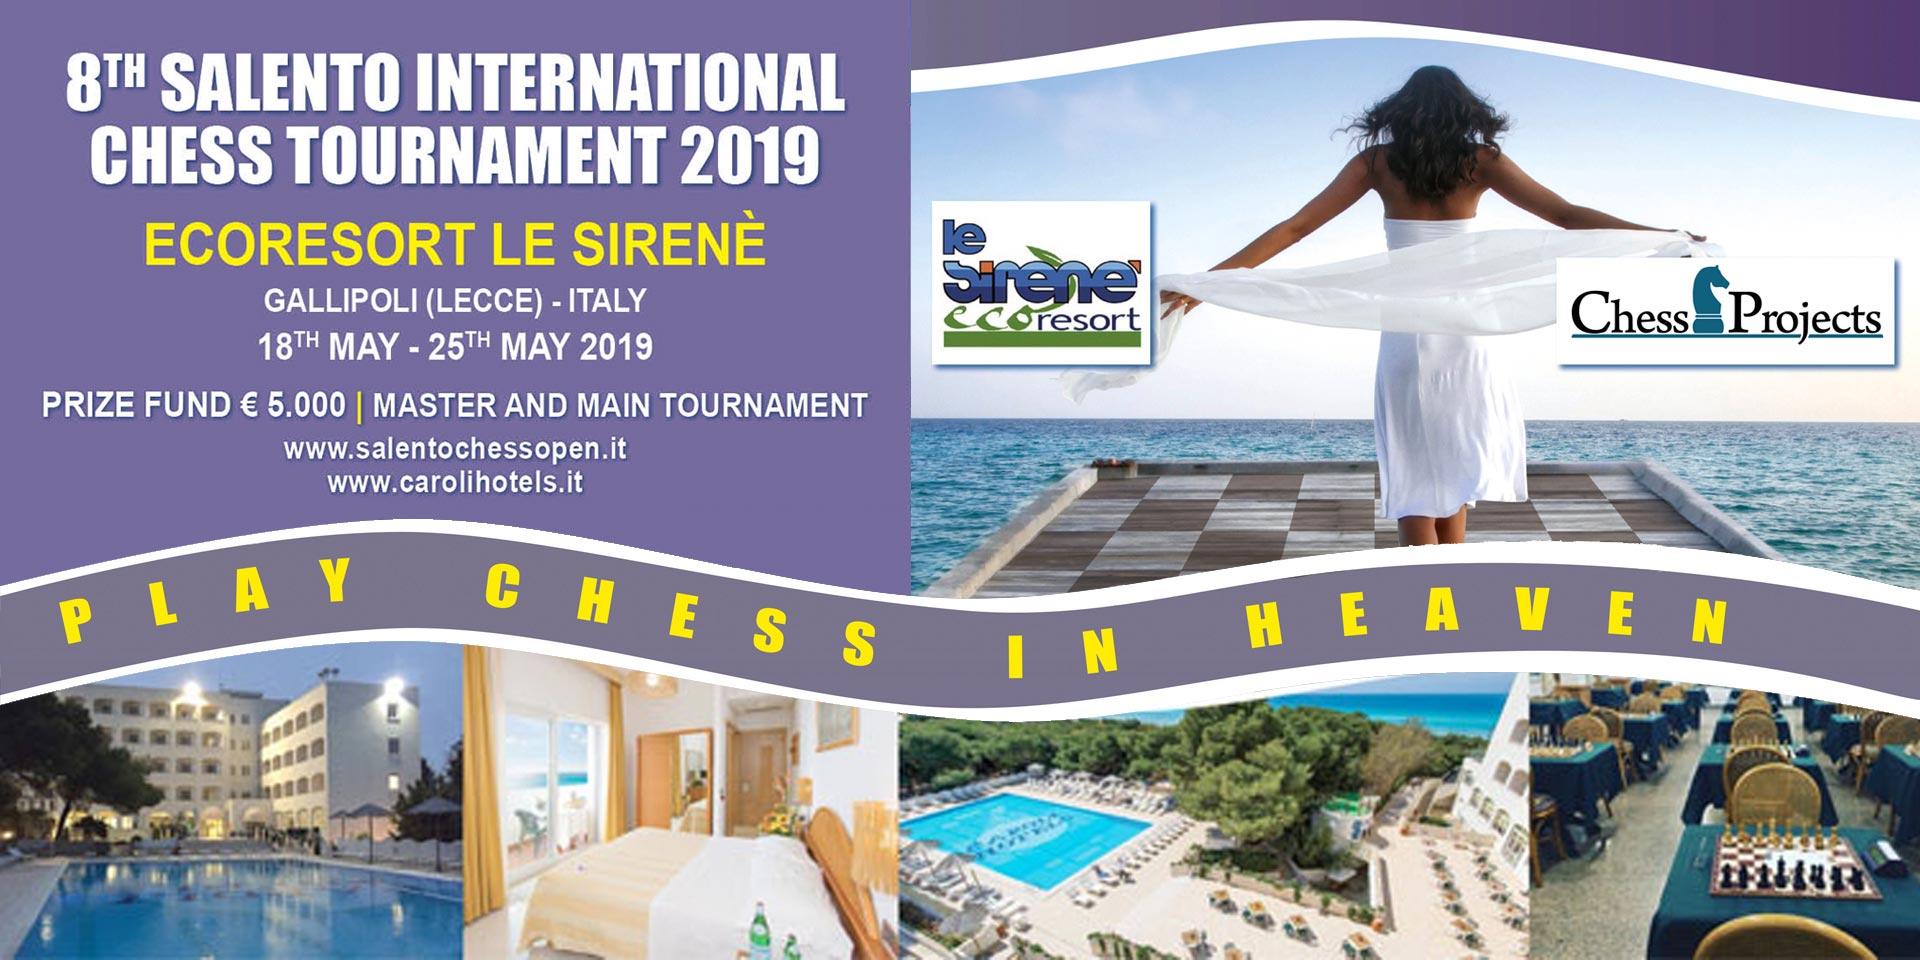 8TH SALENTO INTERNATIONAL CHESS TOURNAMENT 2019